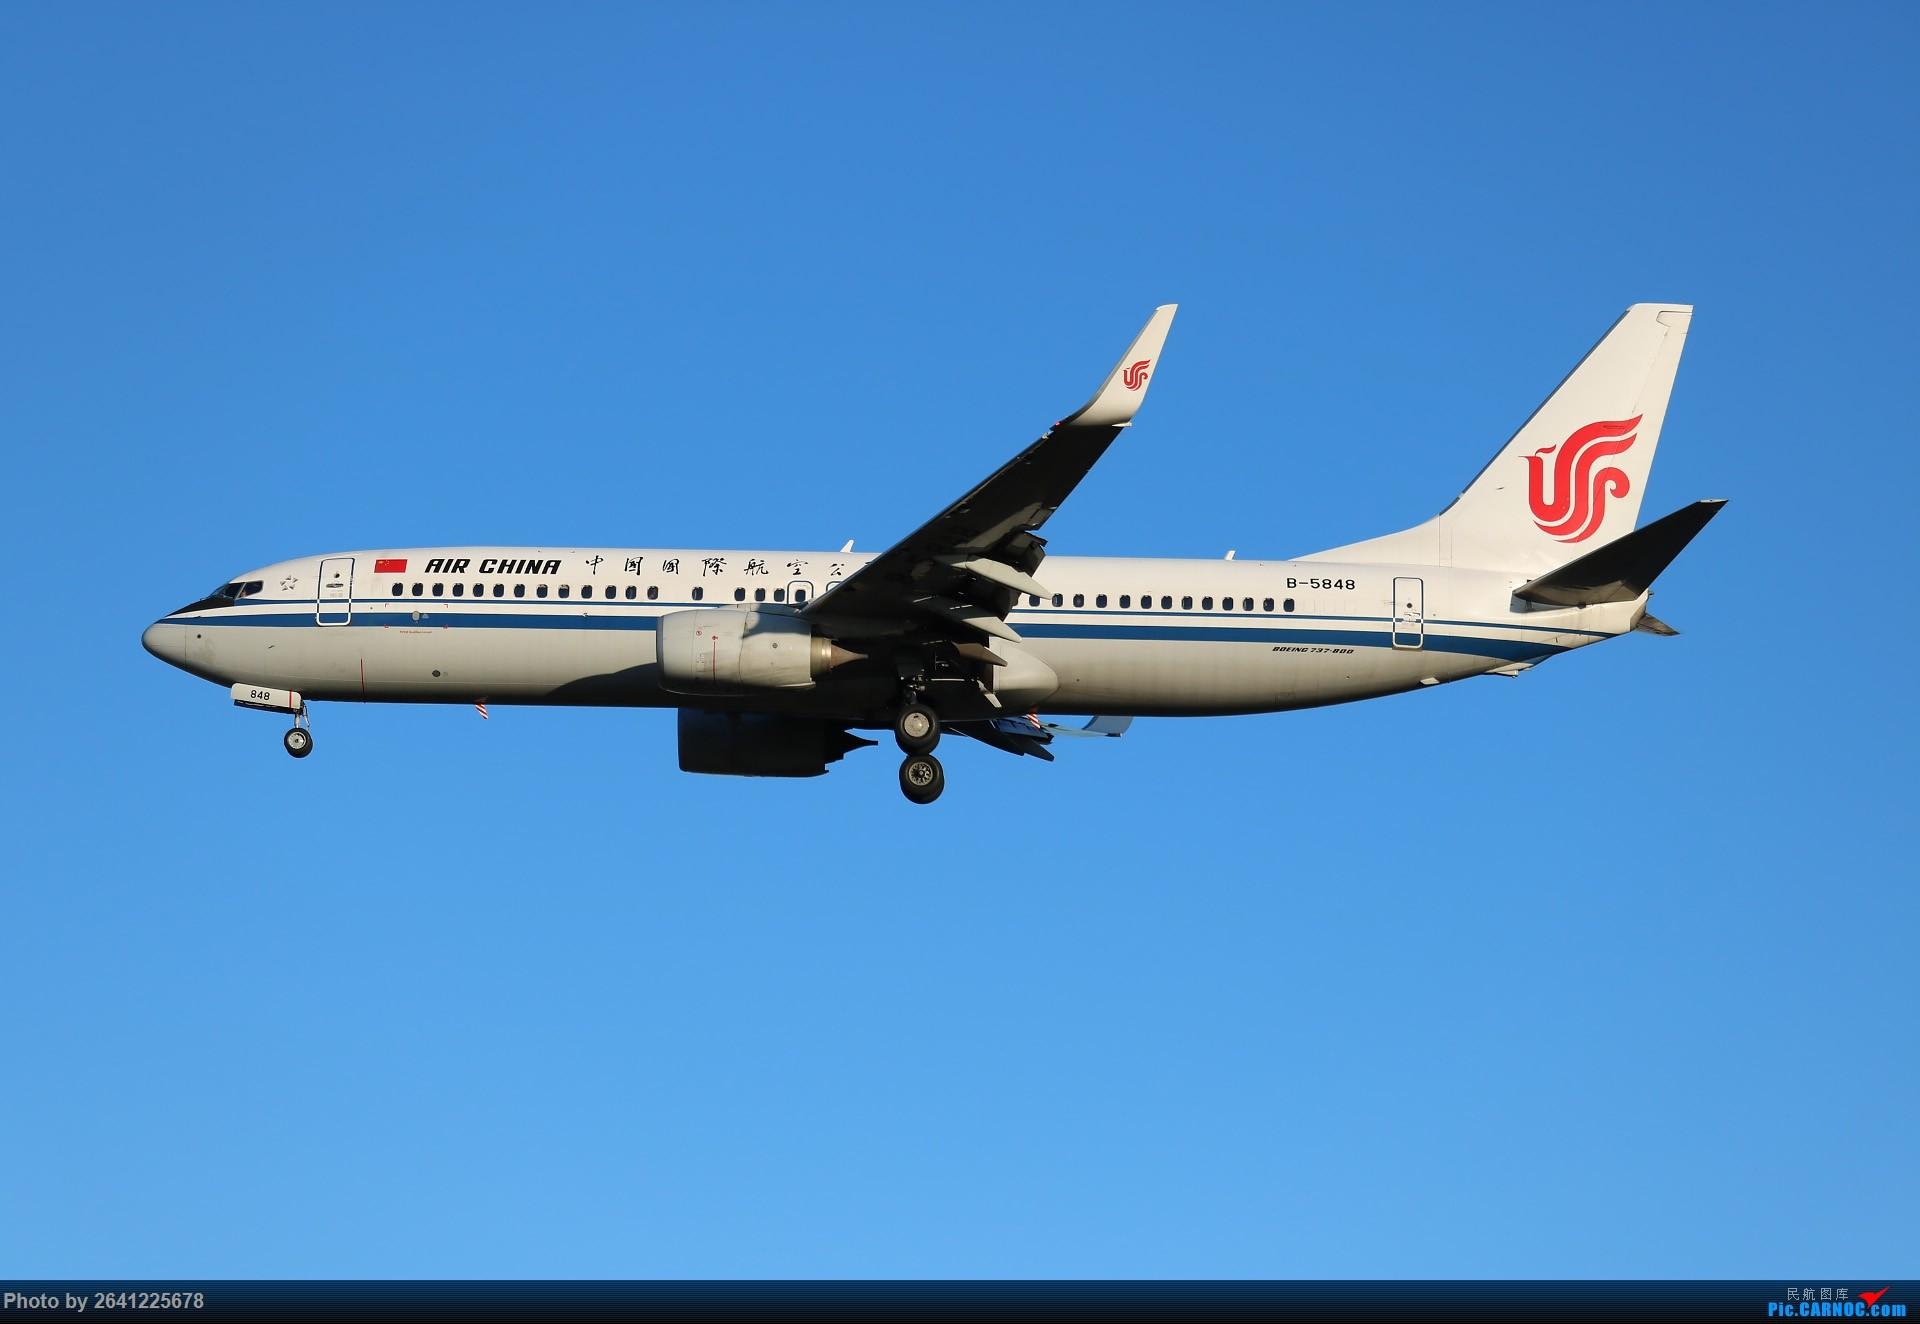 Re:[原创]没事儿修个图 BOEING 737-800 B-5848 中国北京首都国际机场